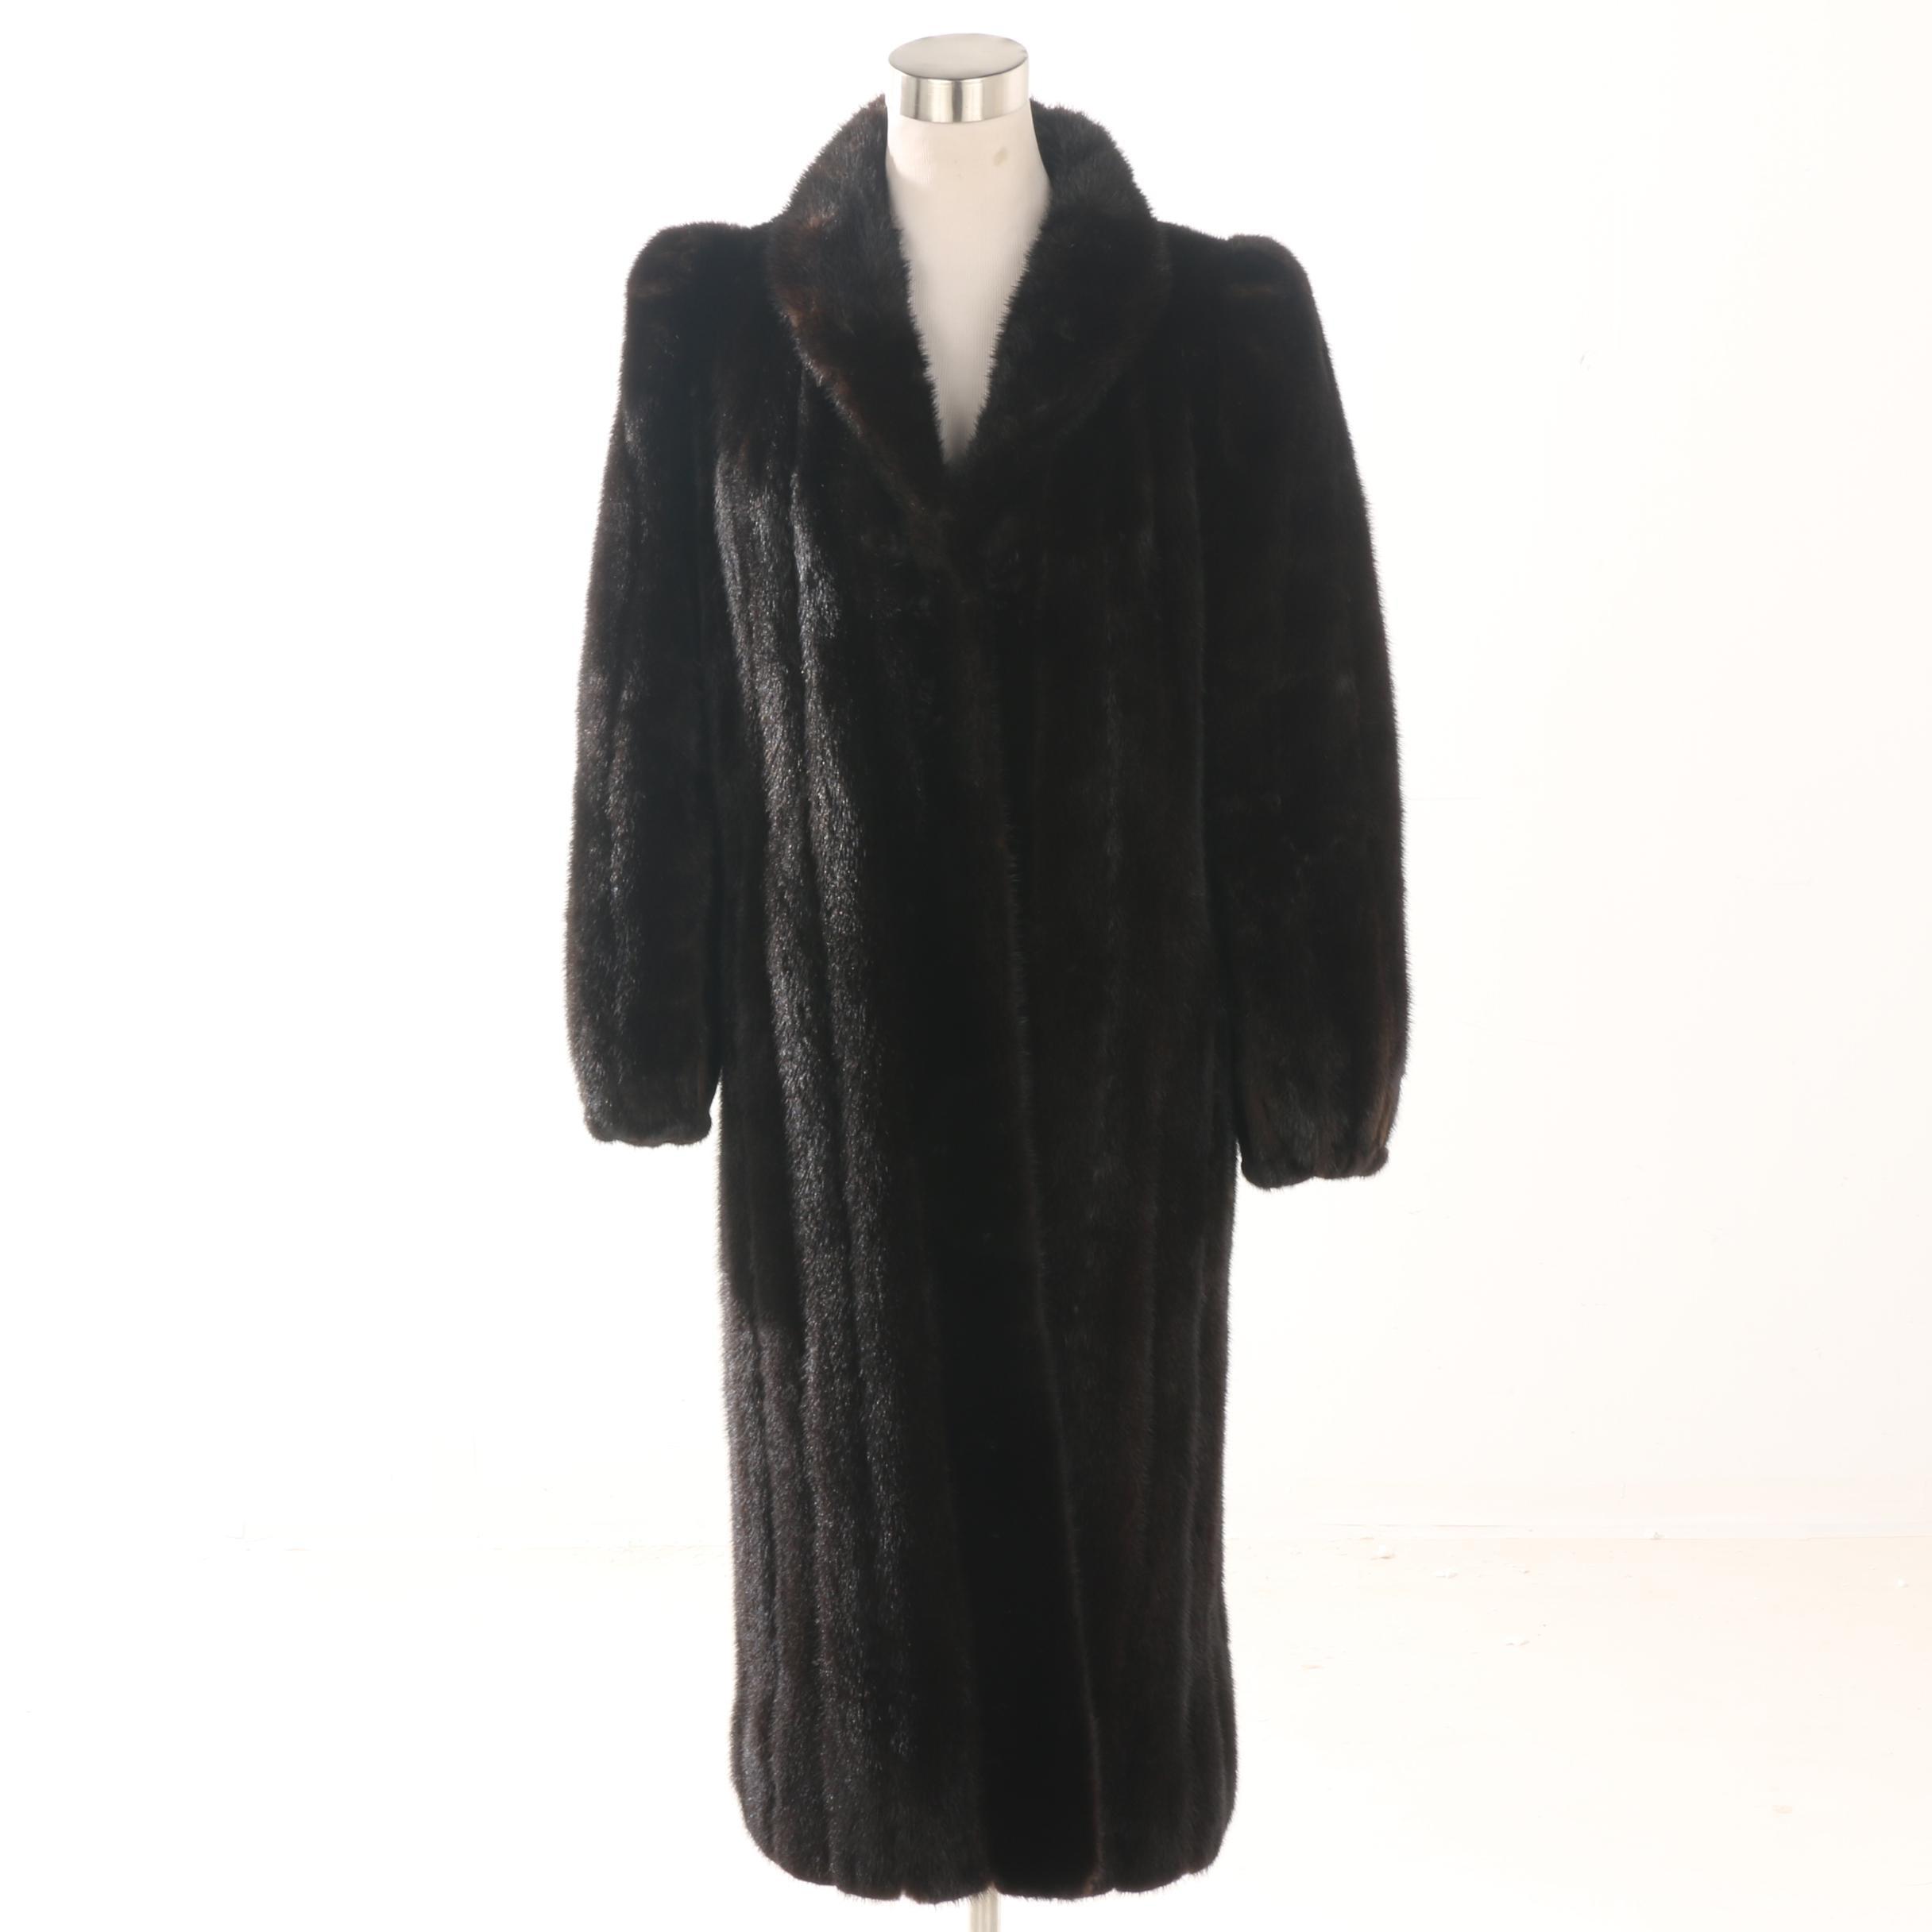 Women's Furs by Clyde Burtrum Dark Mahogany Mink Fur Full-Length Coat